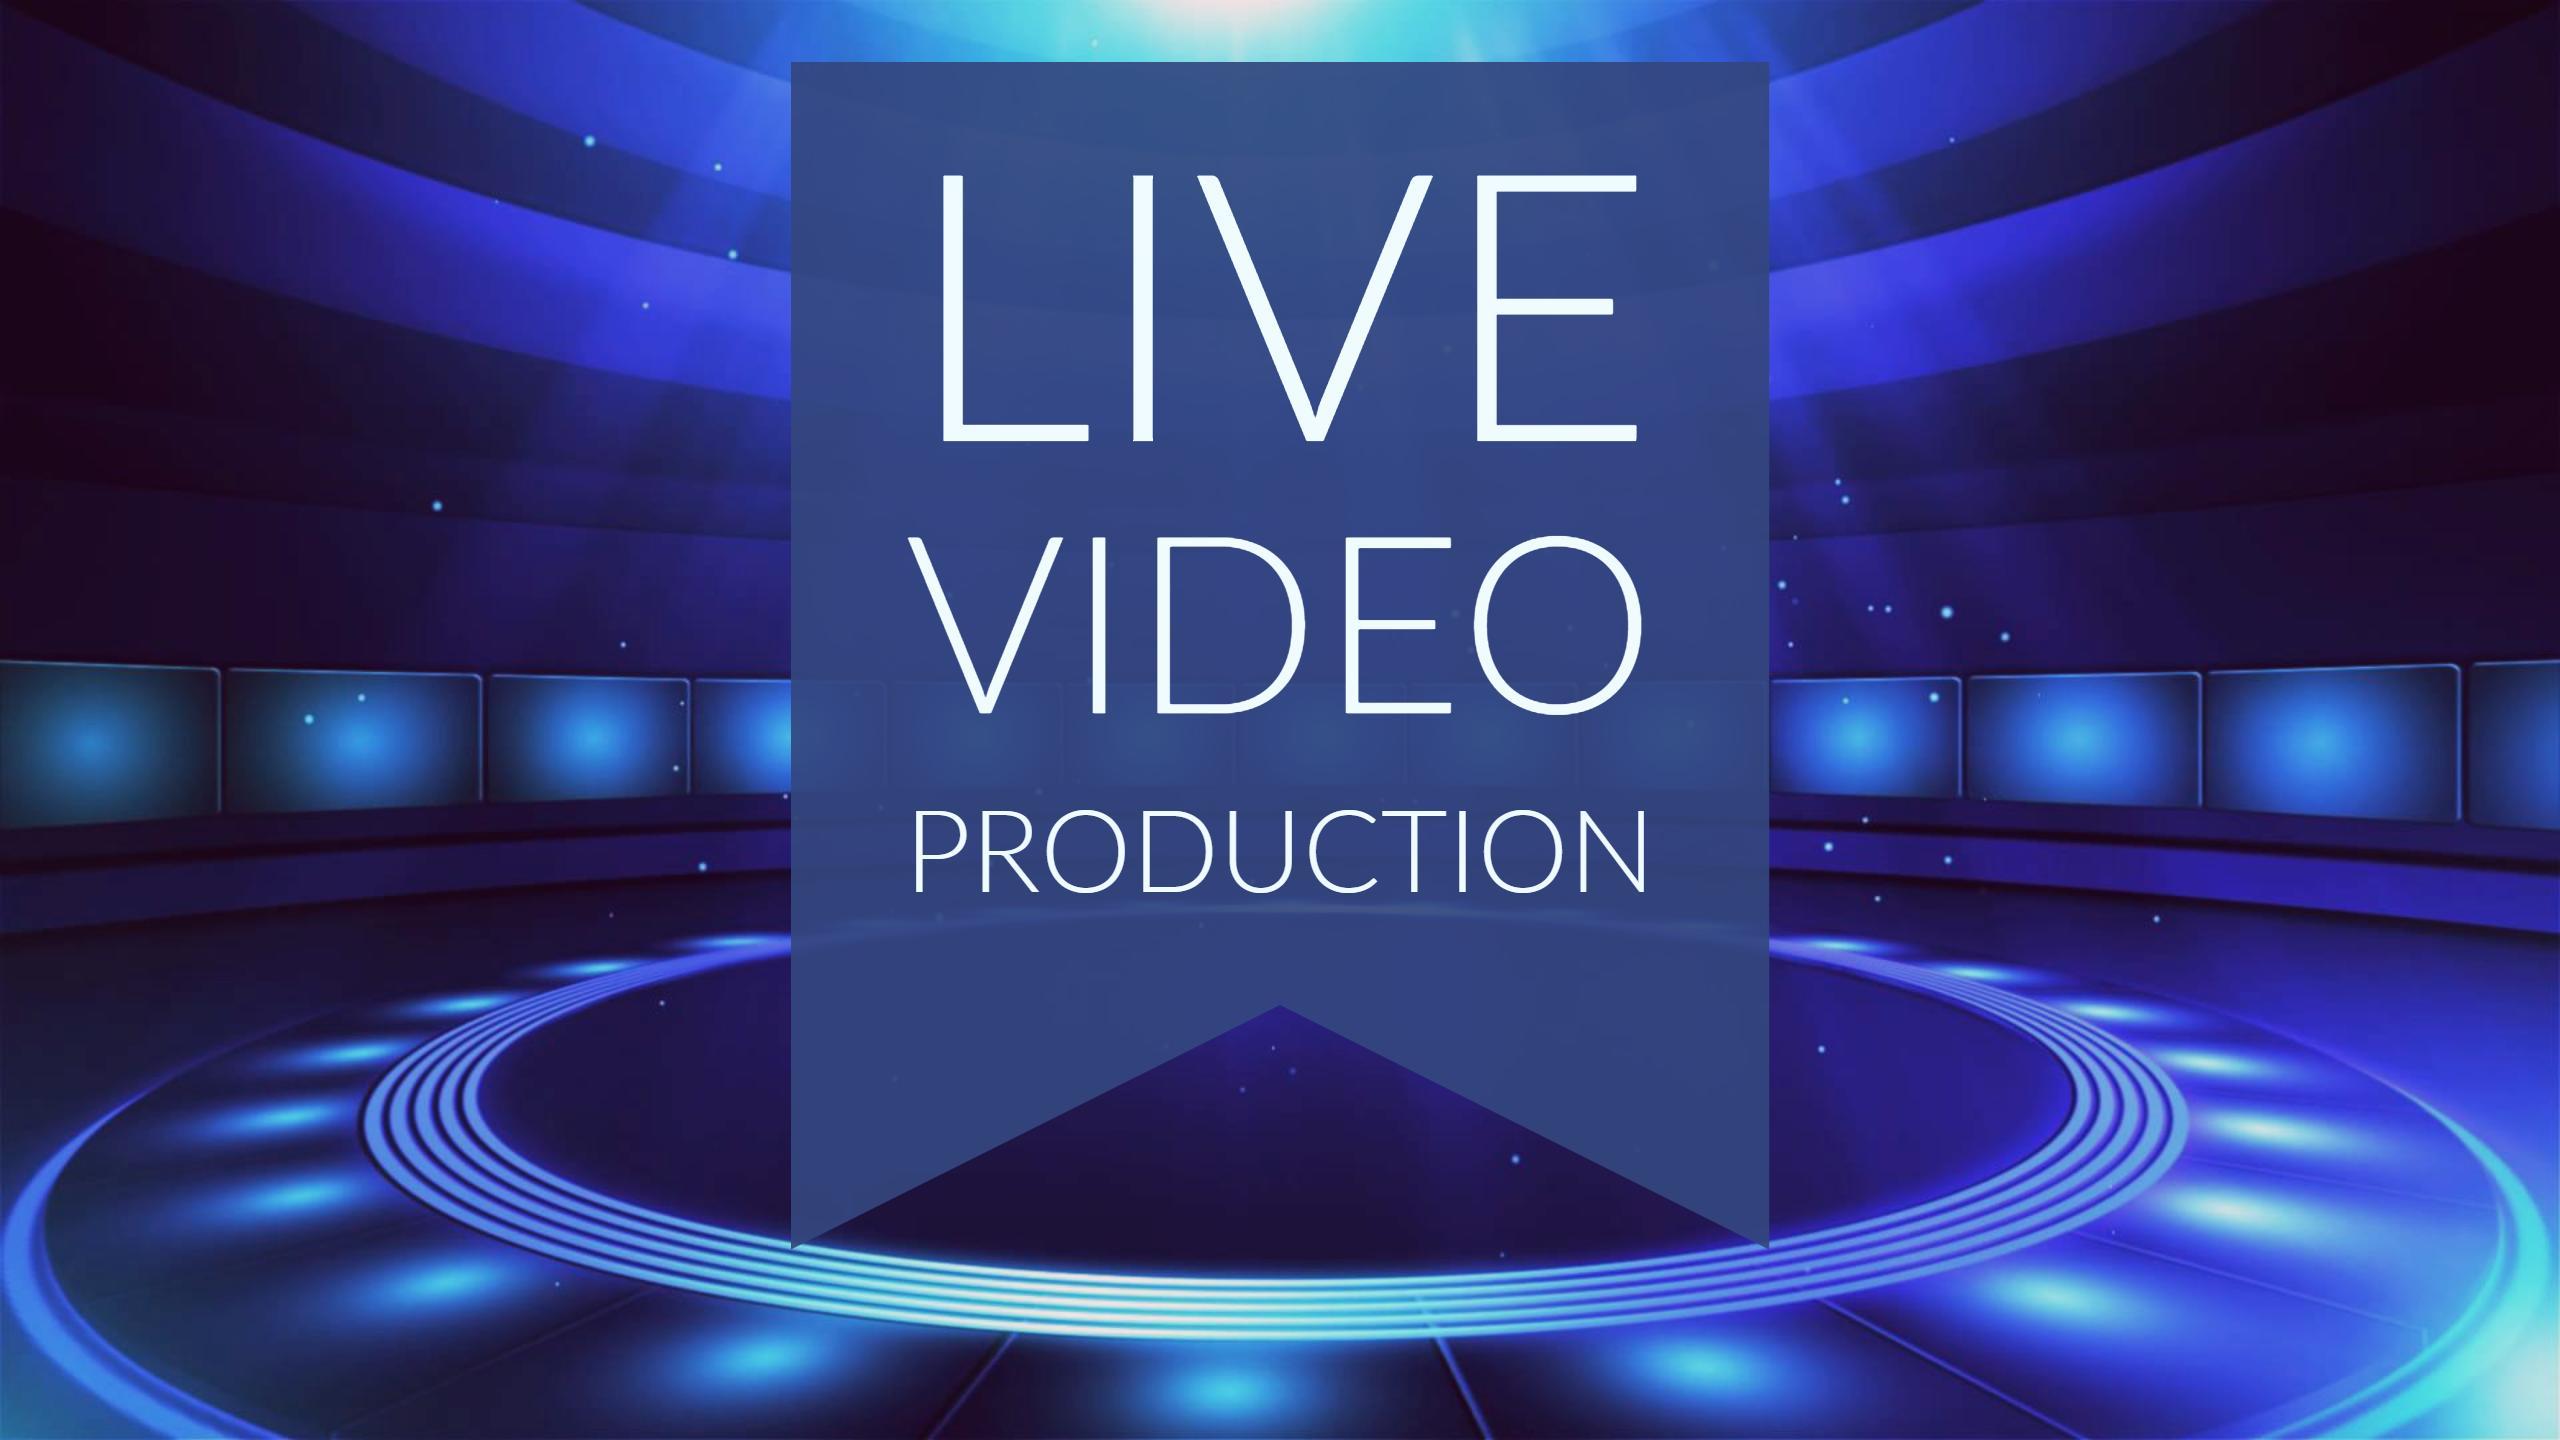 Live Video Production CTA